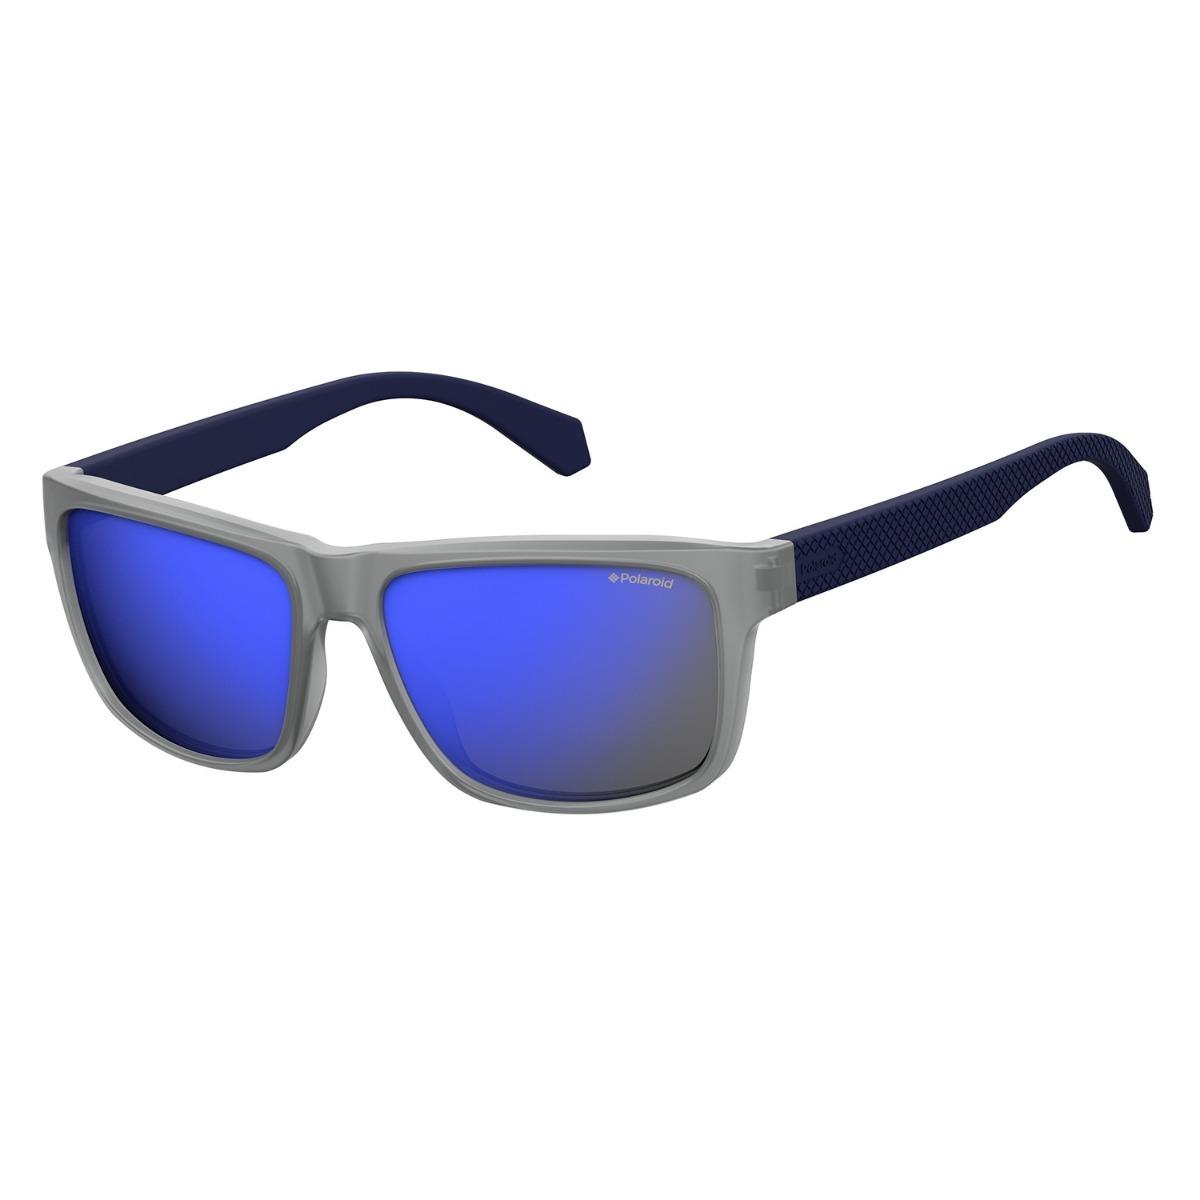 f7a3f99356 Lentes De Sol Hombre Polaroid Polarizados Originales 2058/s ... polaroid  gafas de